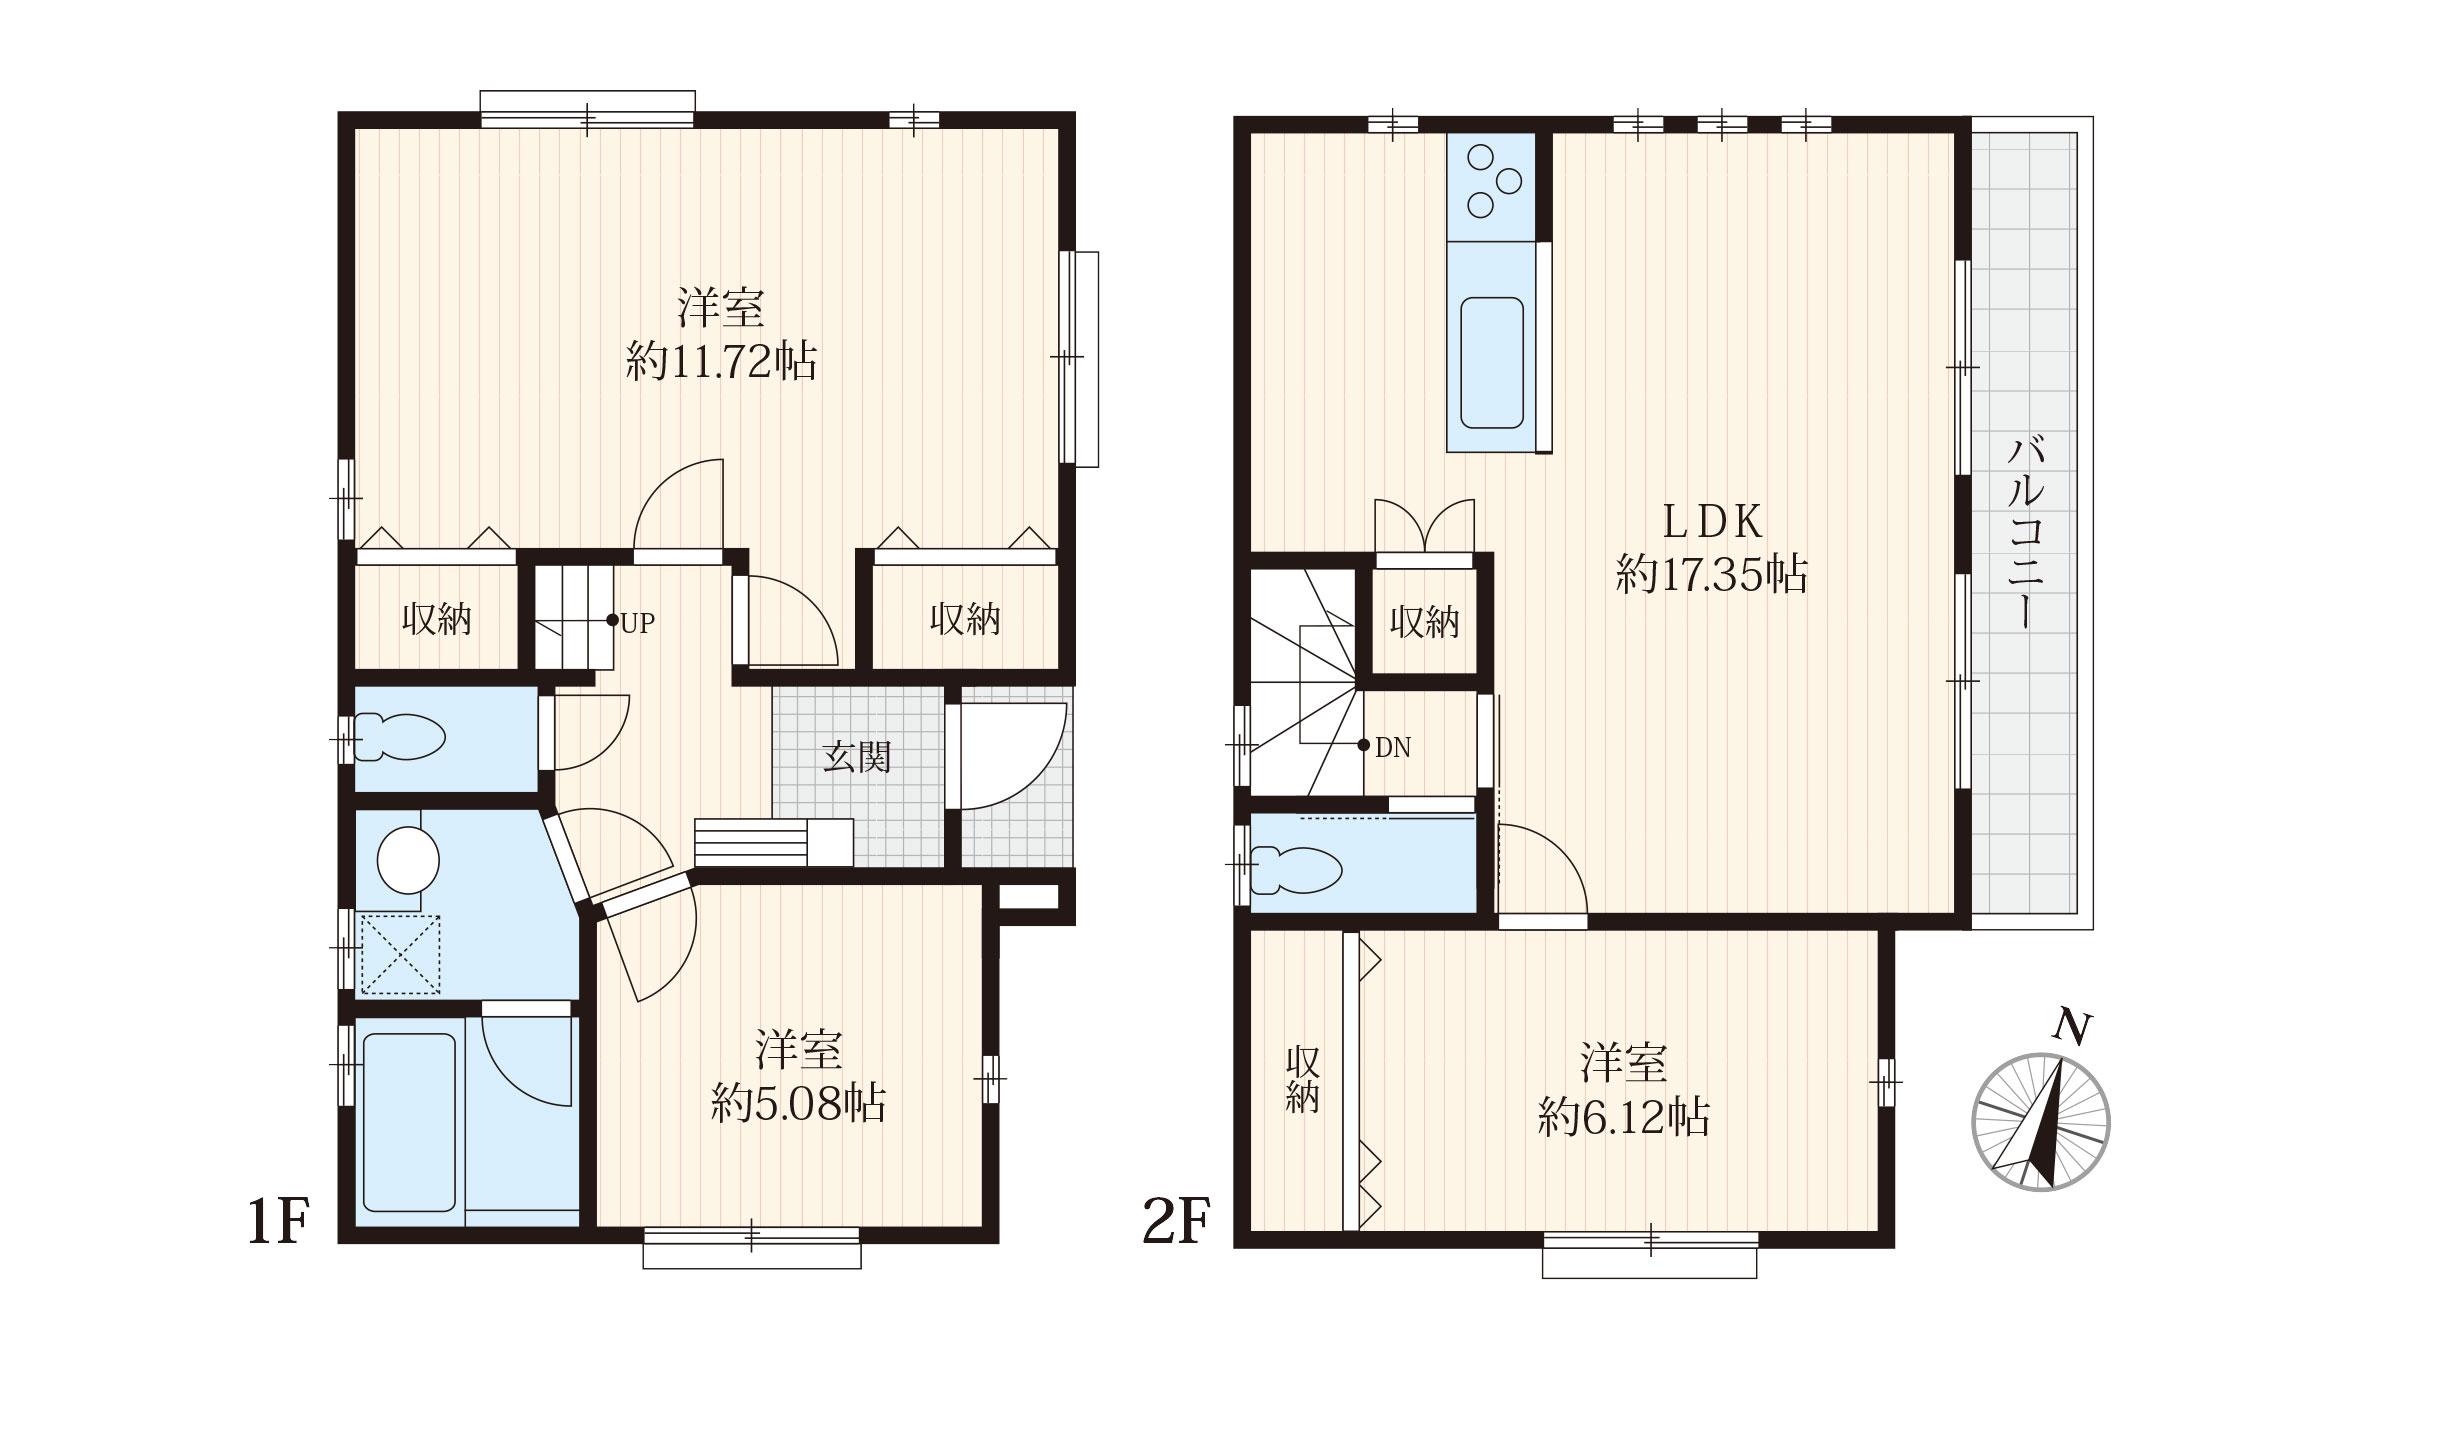 ■3LDK 、主寝室広々約11.72帖、角地